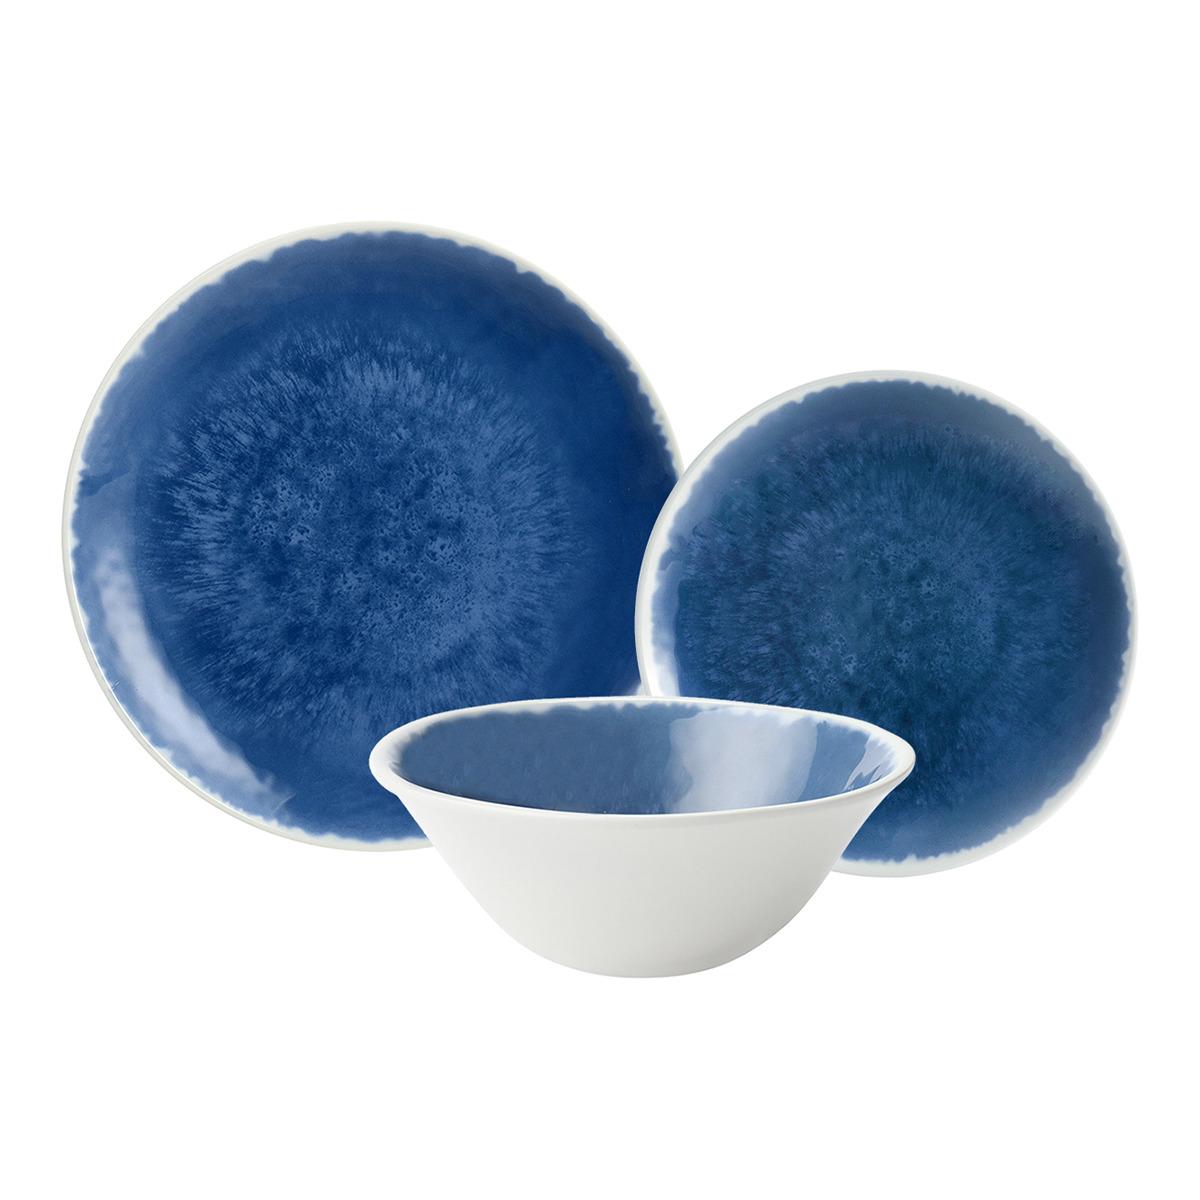 Vajilla en melamina en azul